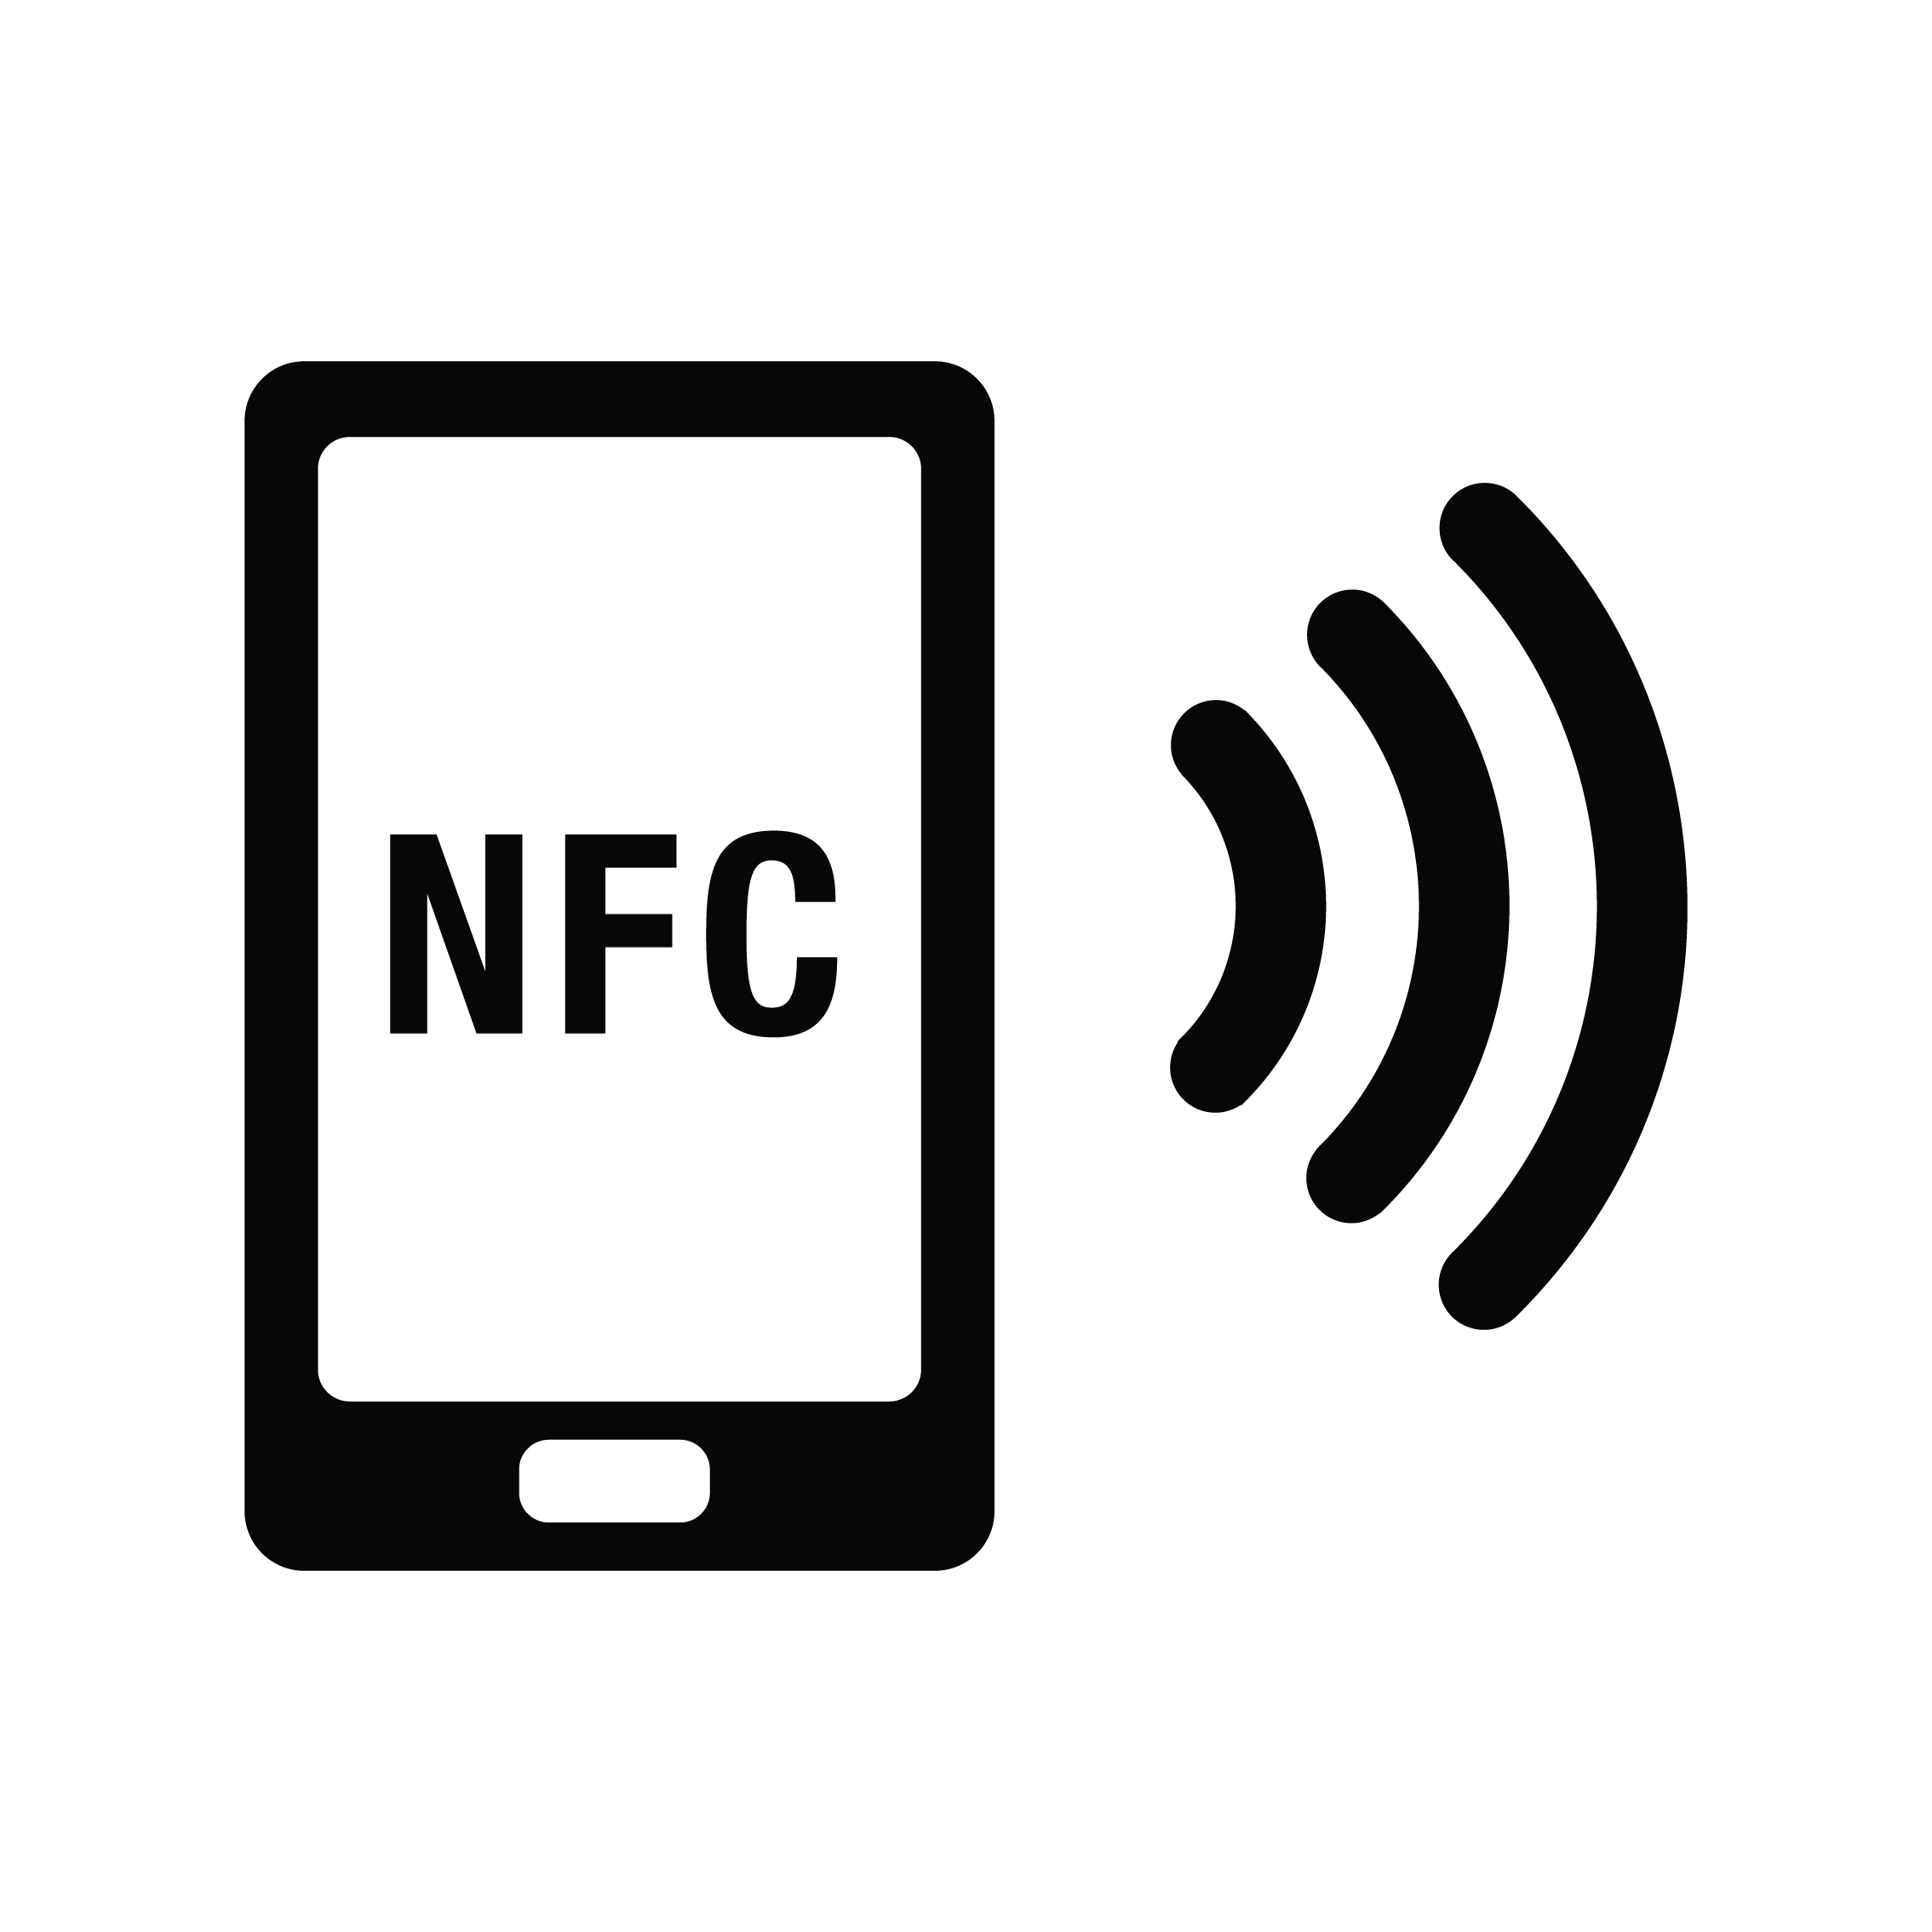 /g/ - Technology - Nfc PNG